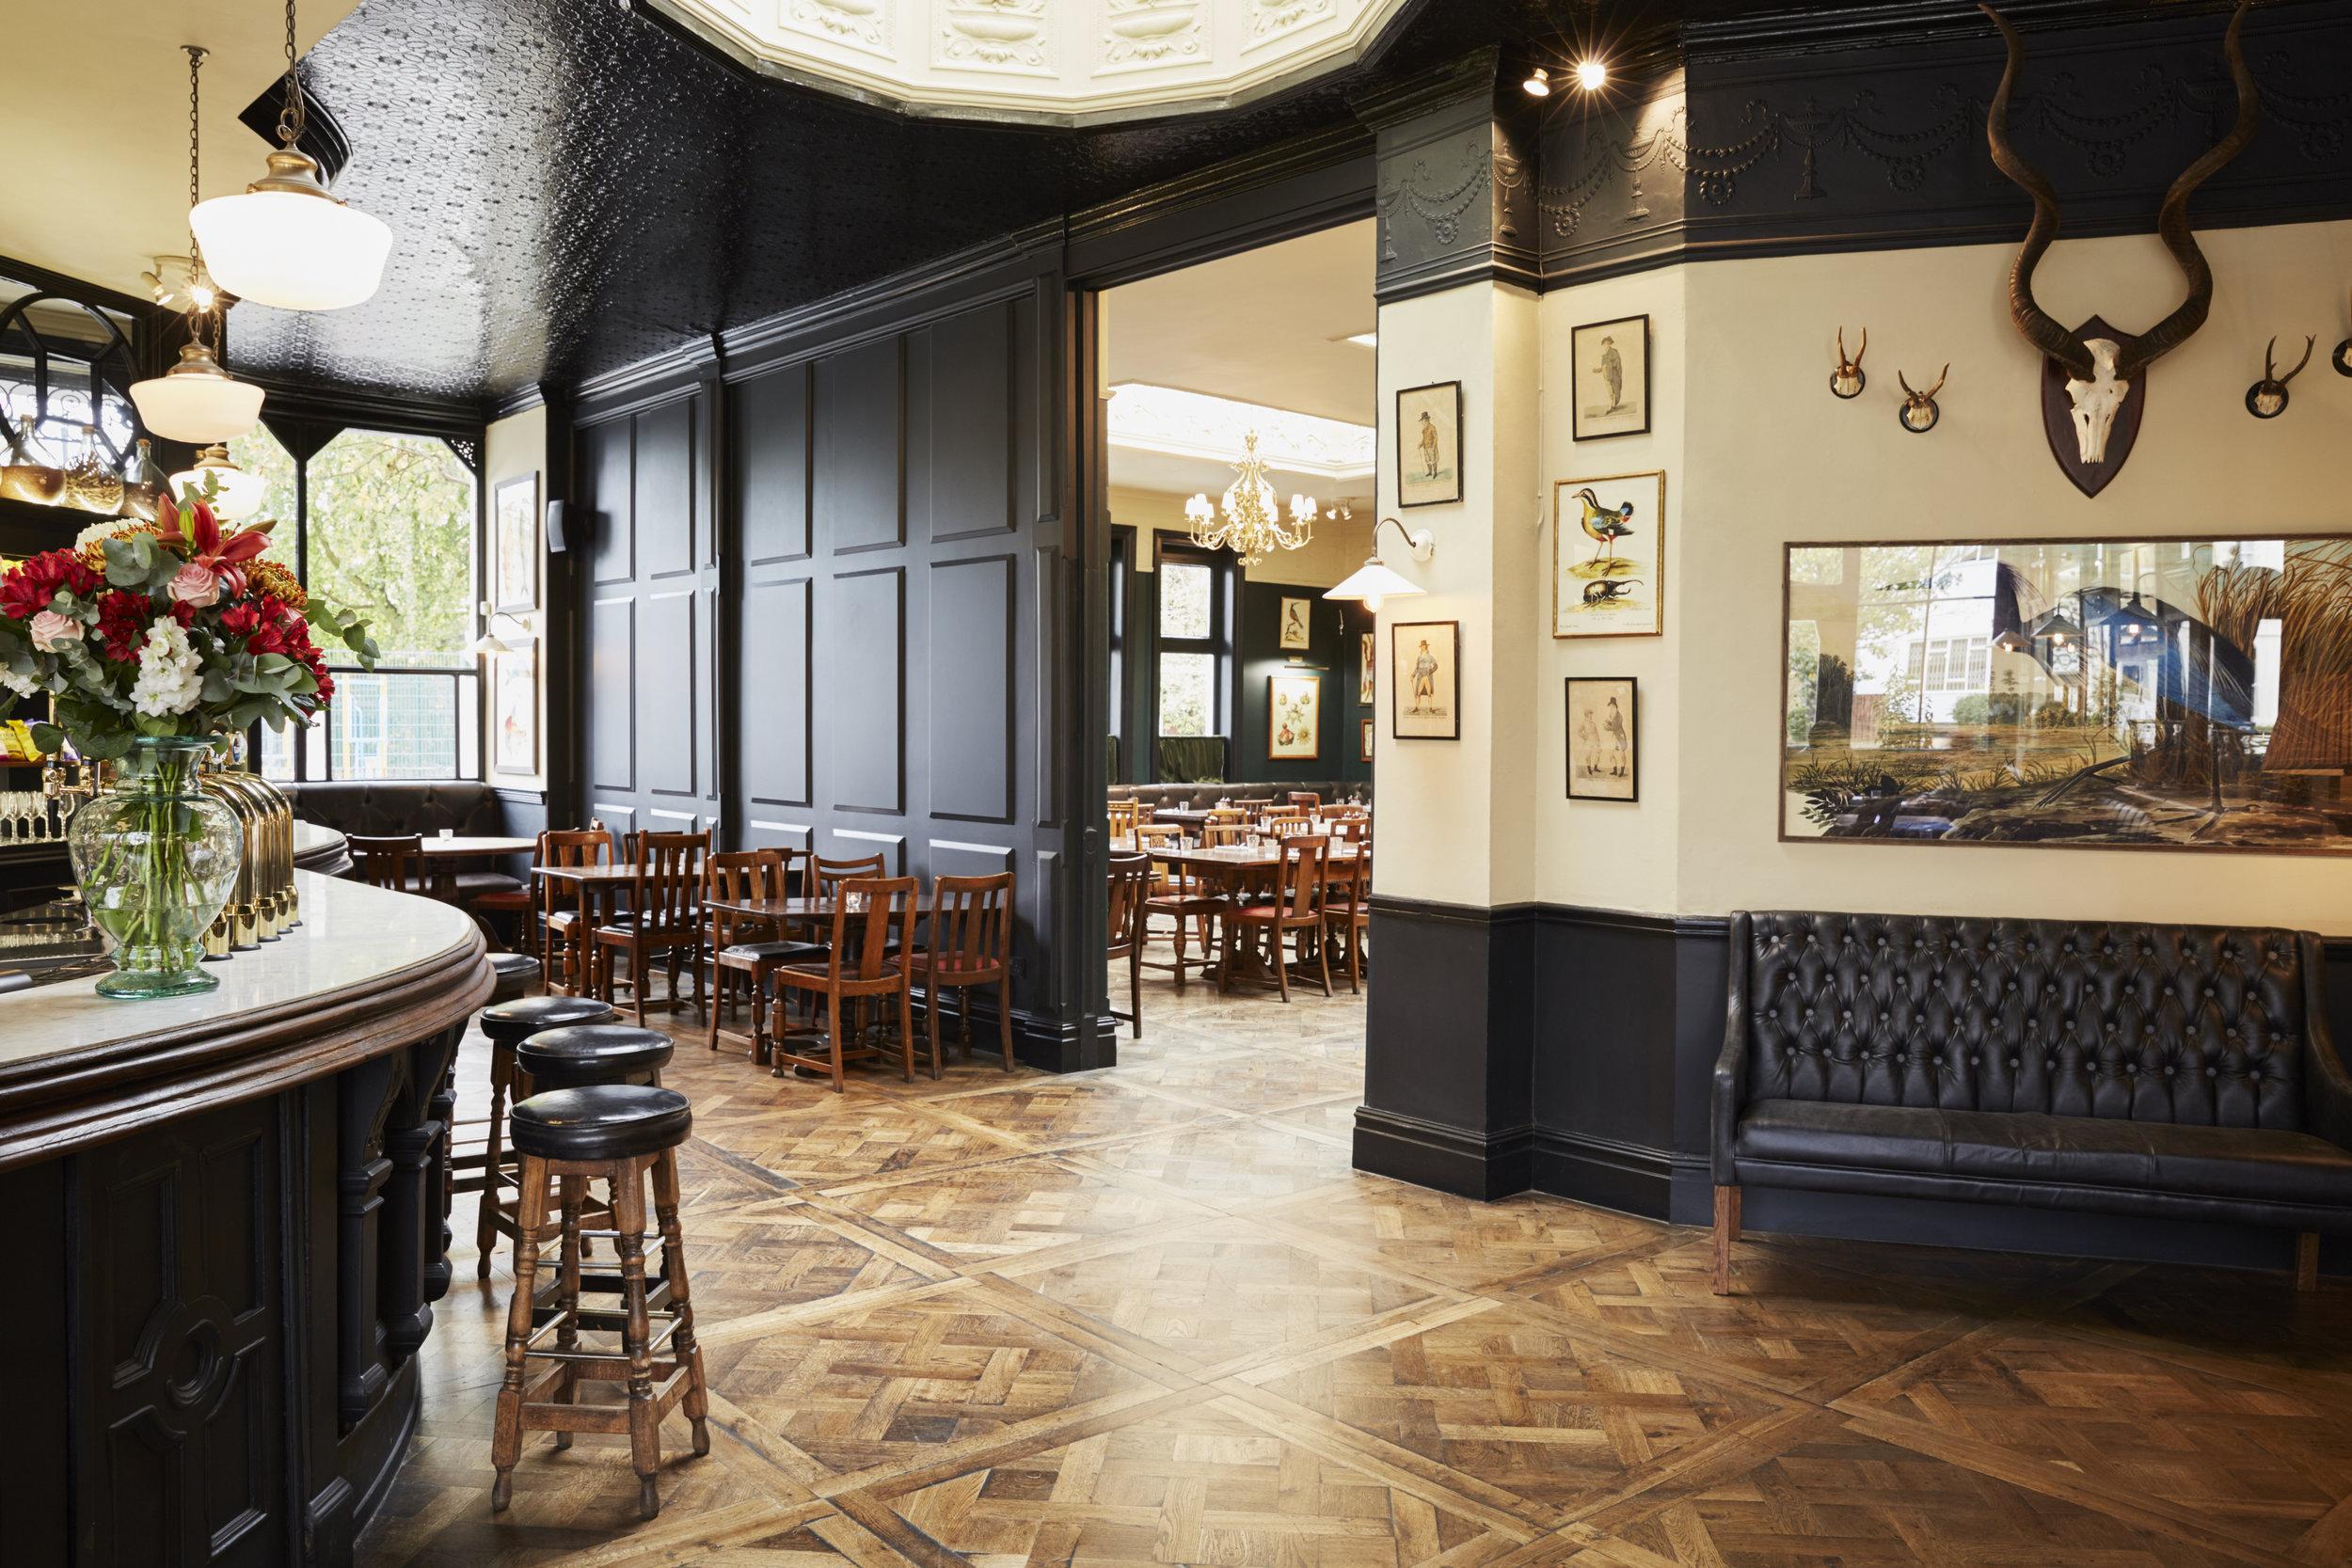 The-bar-at-The-Princess-Victoria-Shepherds-Bush-1.jpg